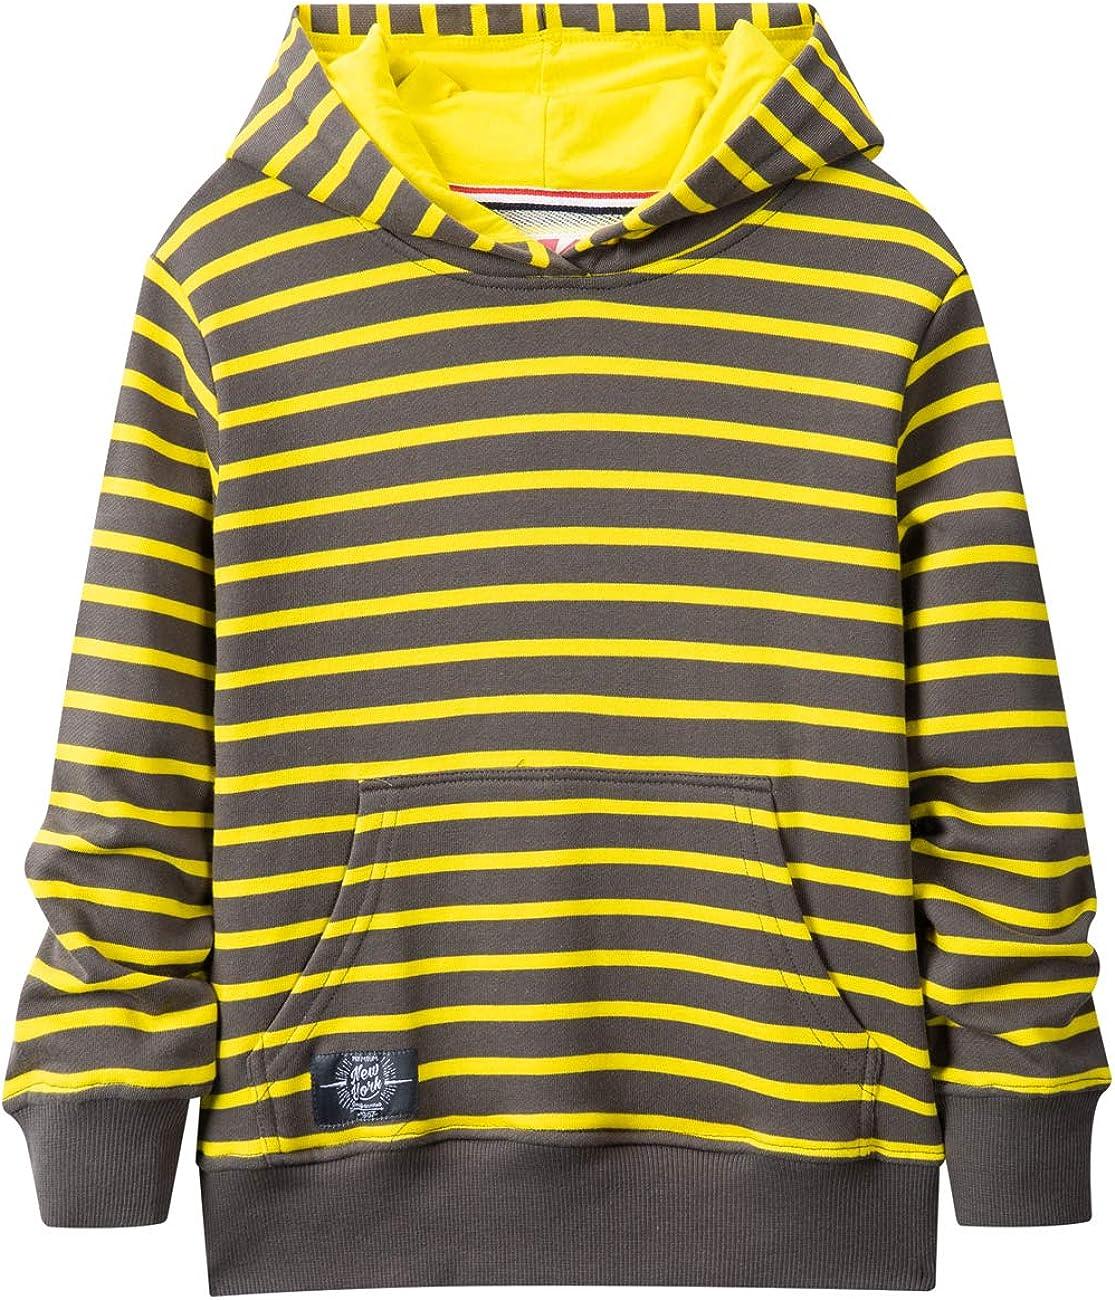 WIYOSHY Boys' Hoodie, Soft Cotton Hooded Pullover Sweatshirts